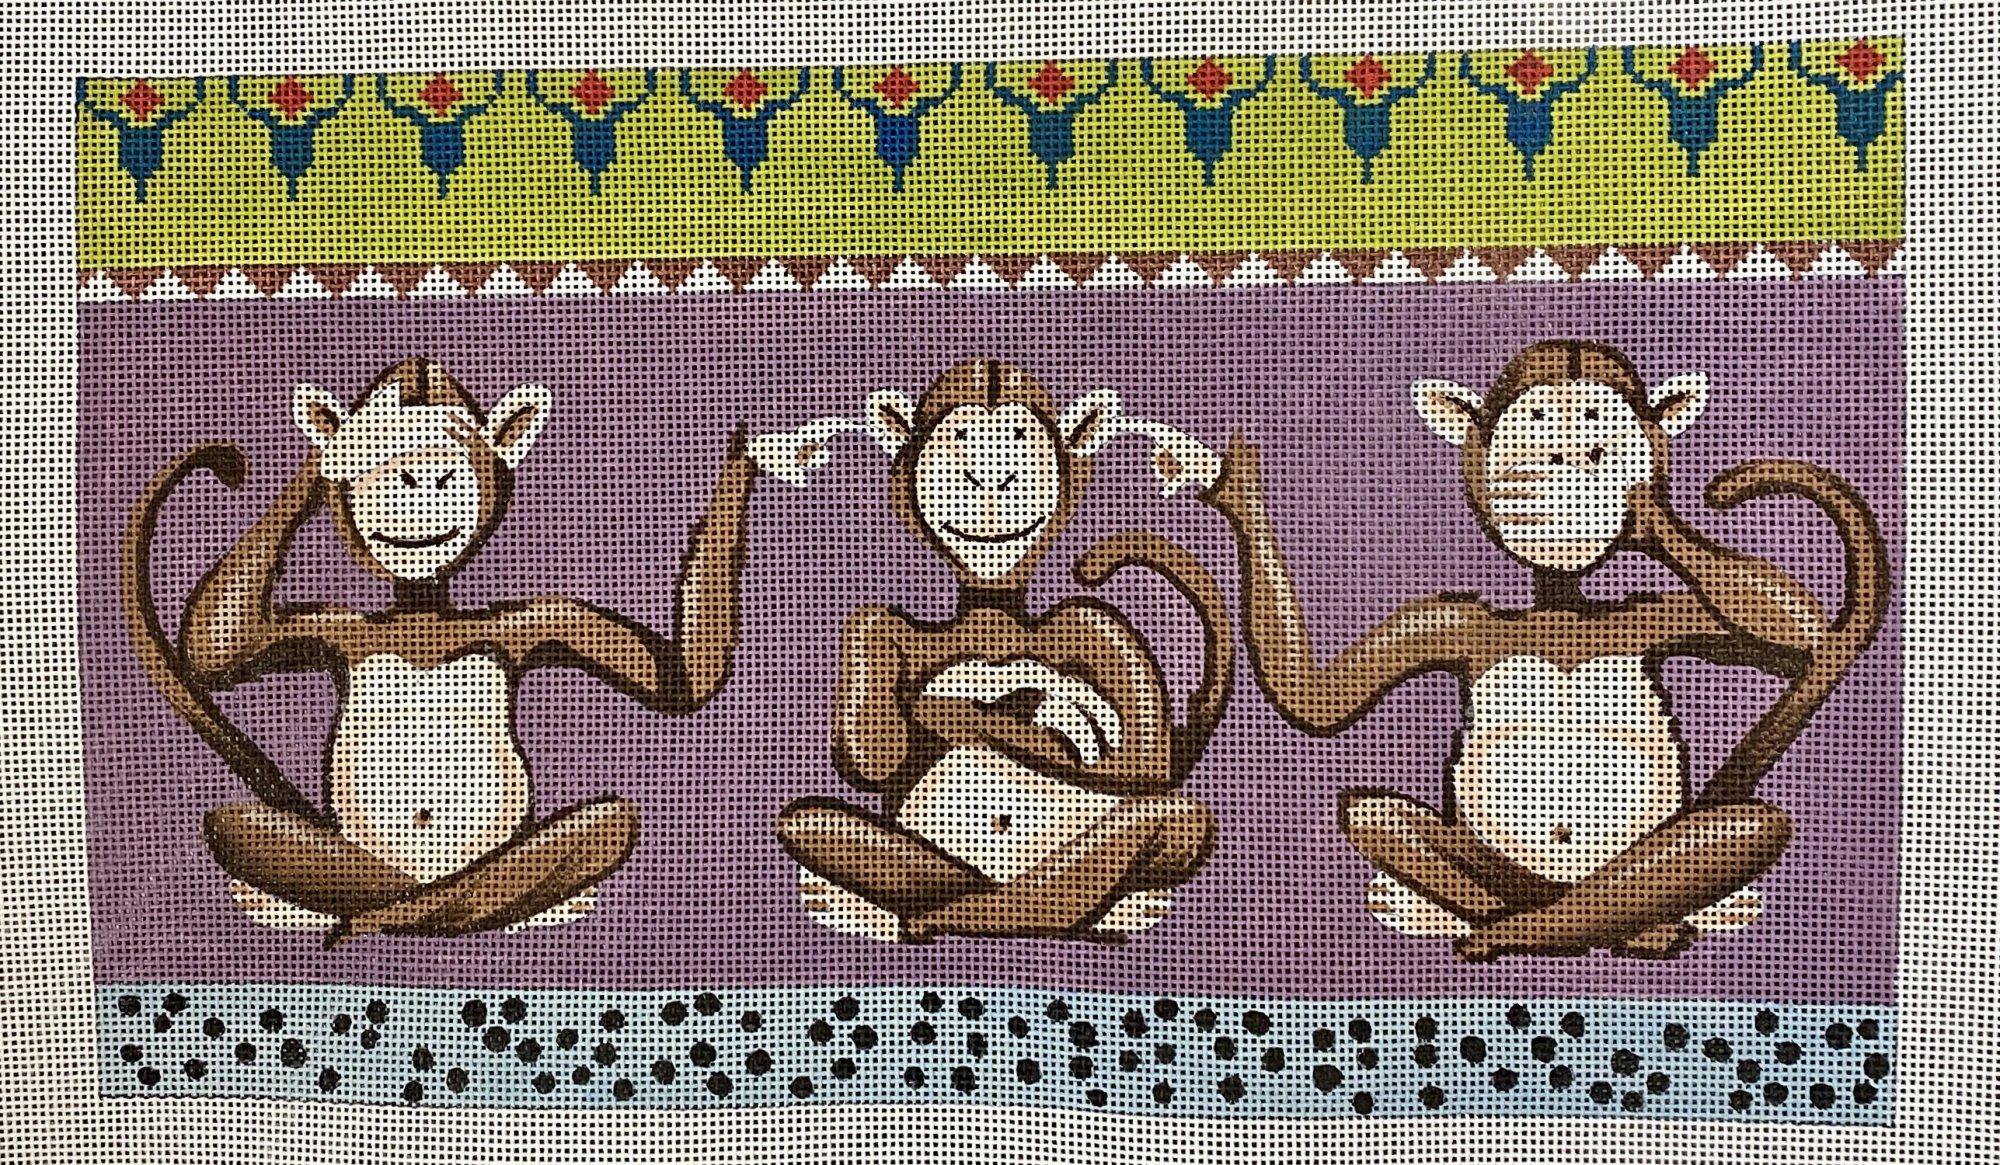 3 monkey...hear, see, speak